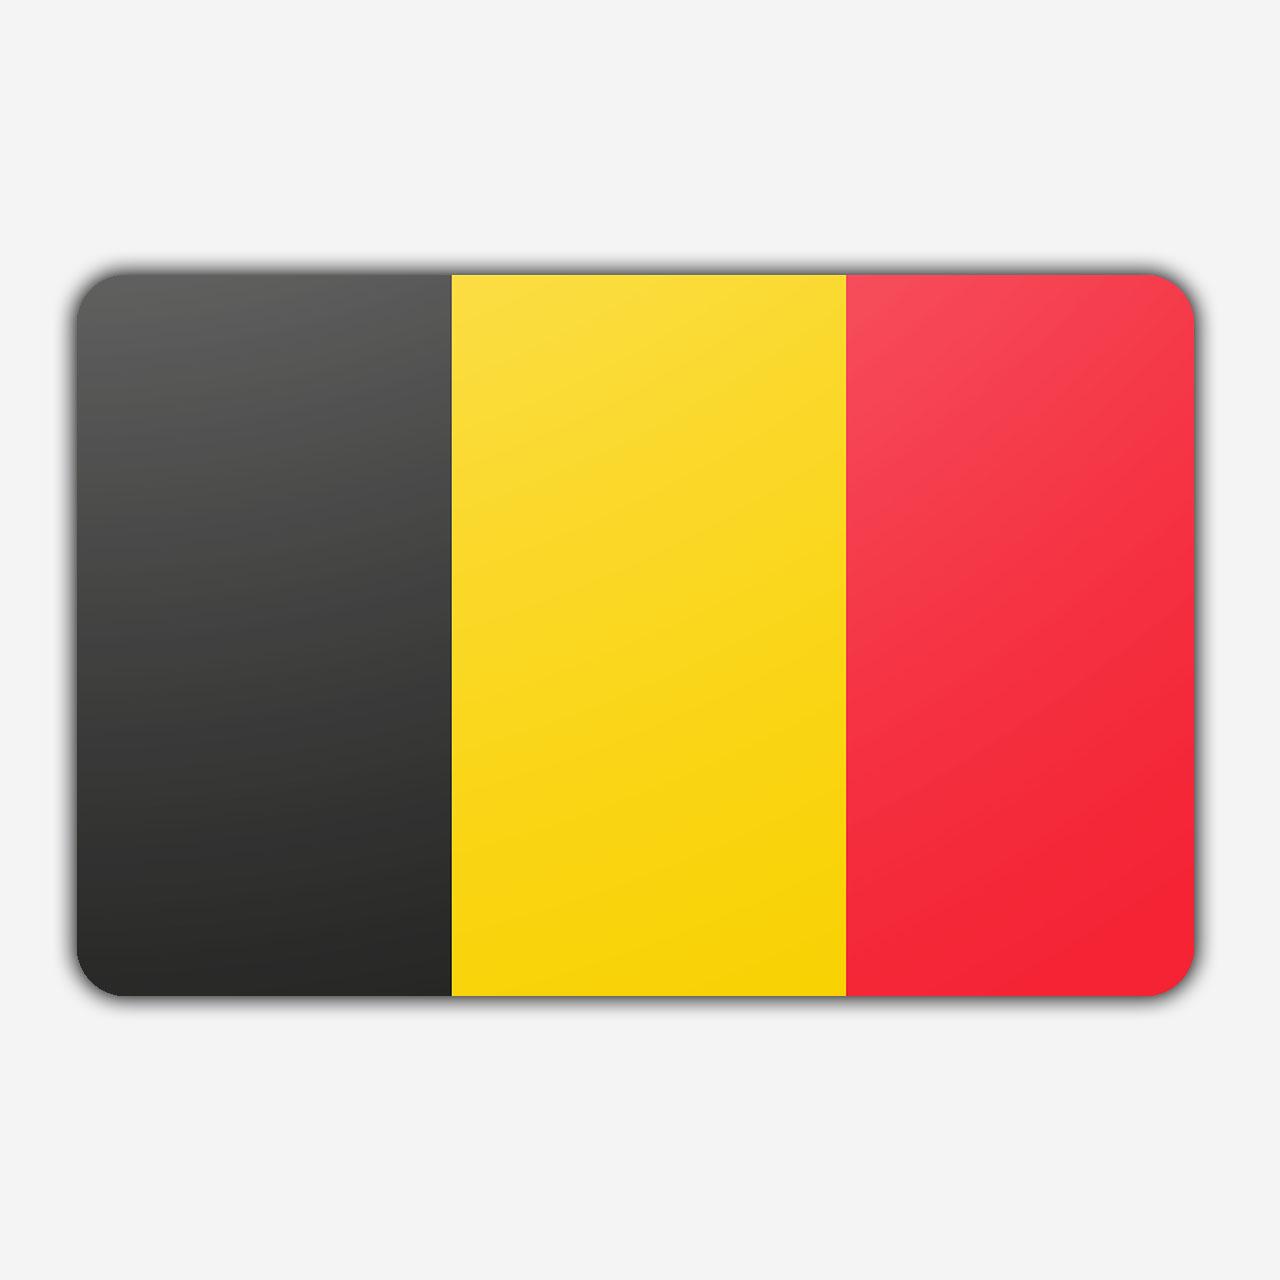 Tafelvlag België